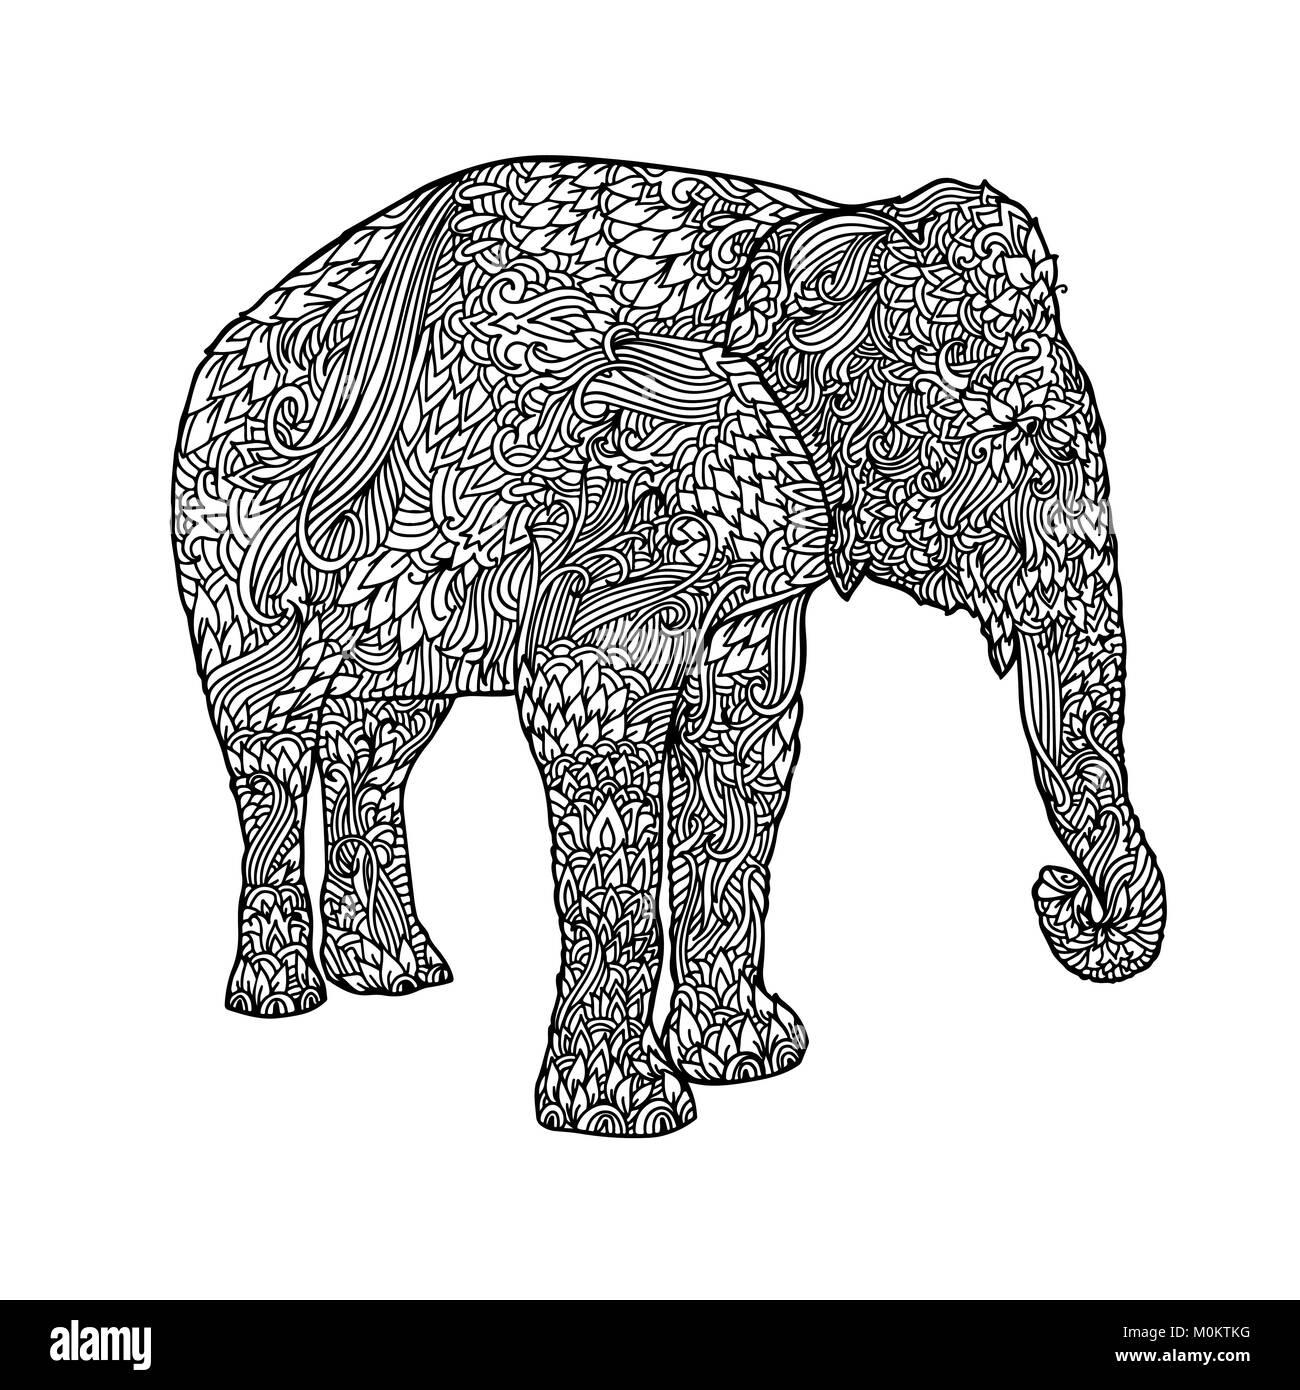 elefanten ausmalbilder fur erwachsene